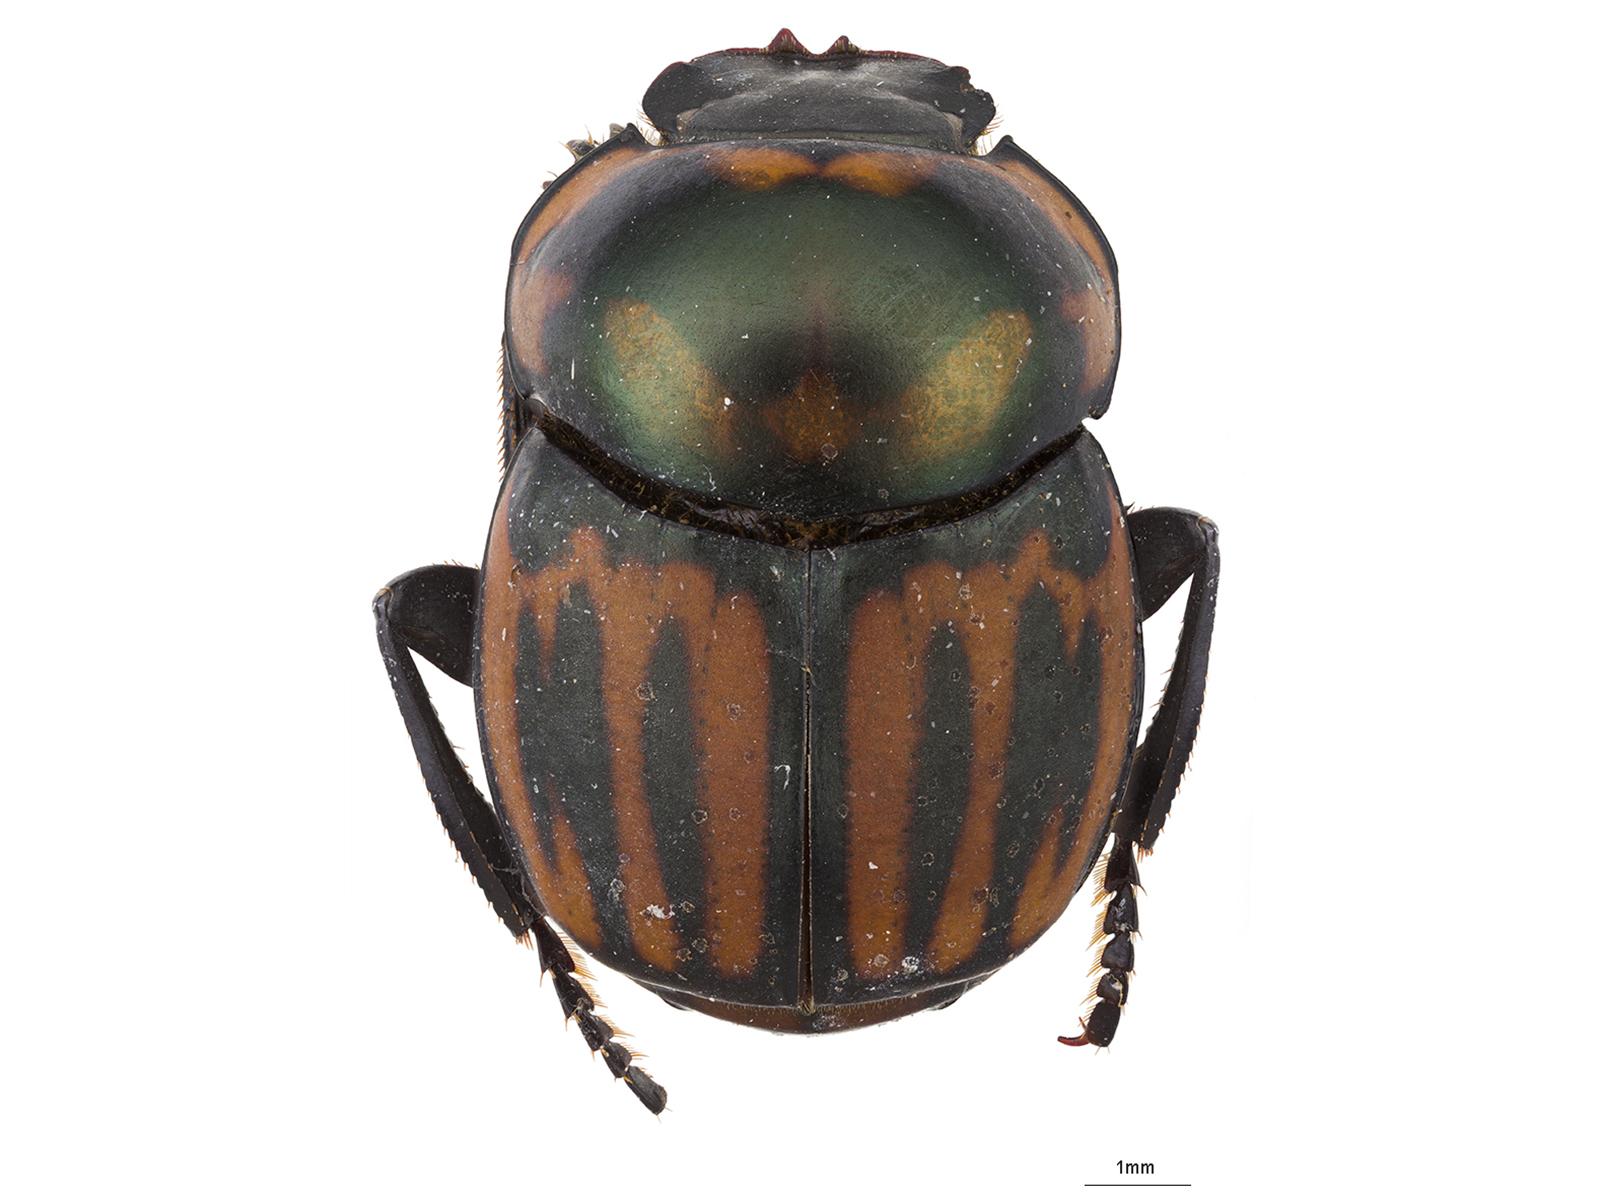 Canthon septemmaculatus var. linearis Schmidt, 1920